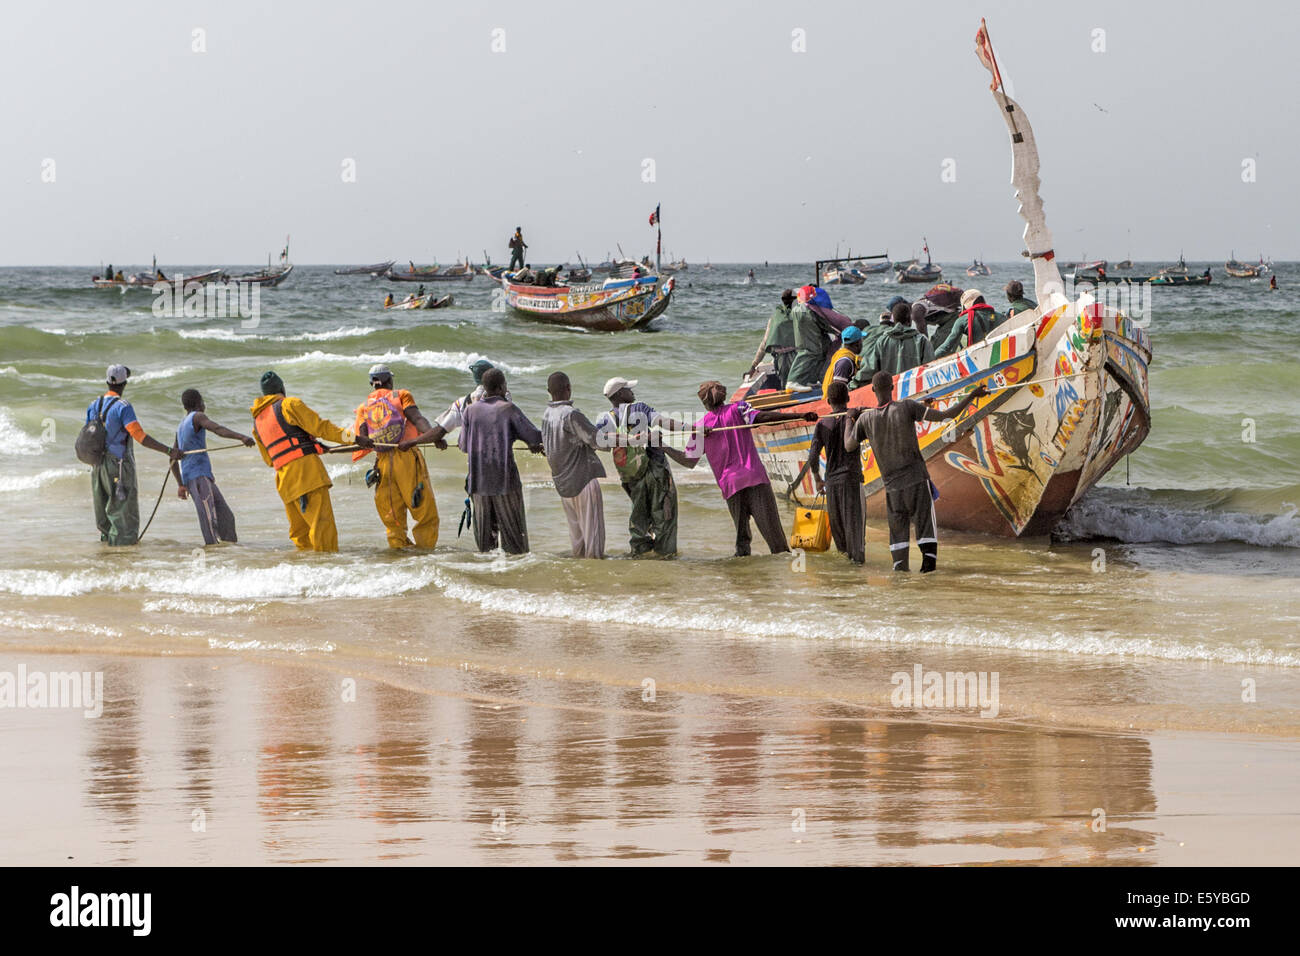 Hauling a Pirogue (fishing boat) onto the beech Kayar Senegal - Stock Image